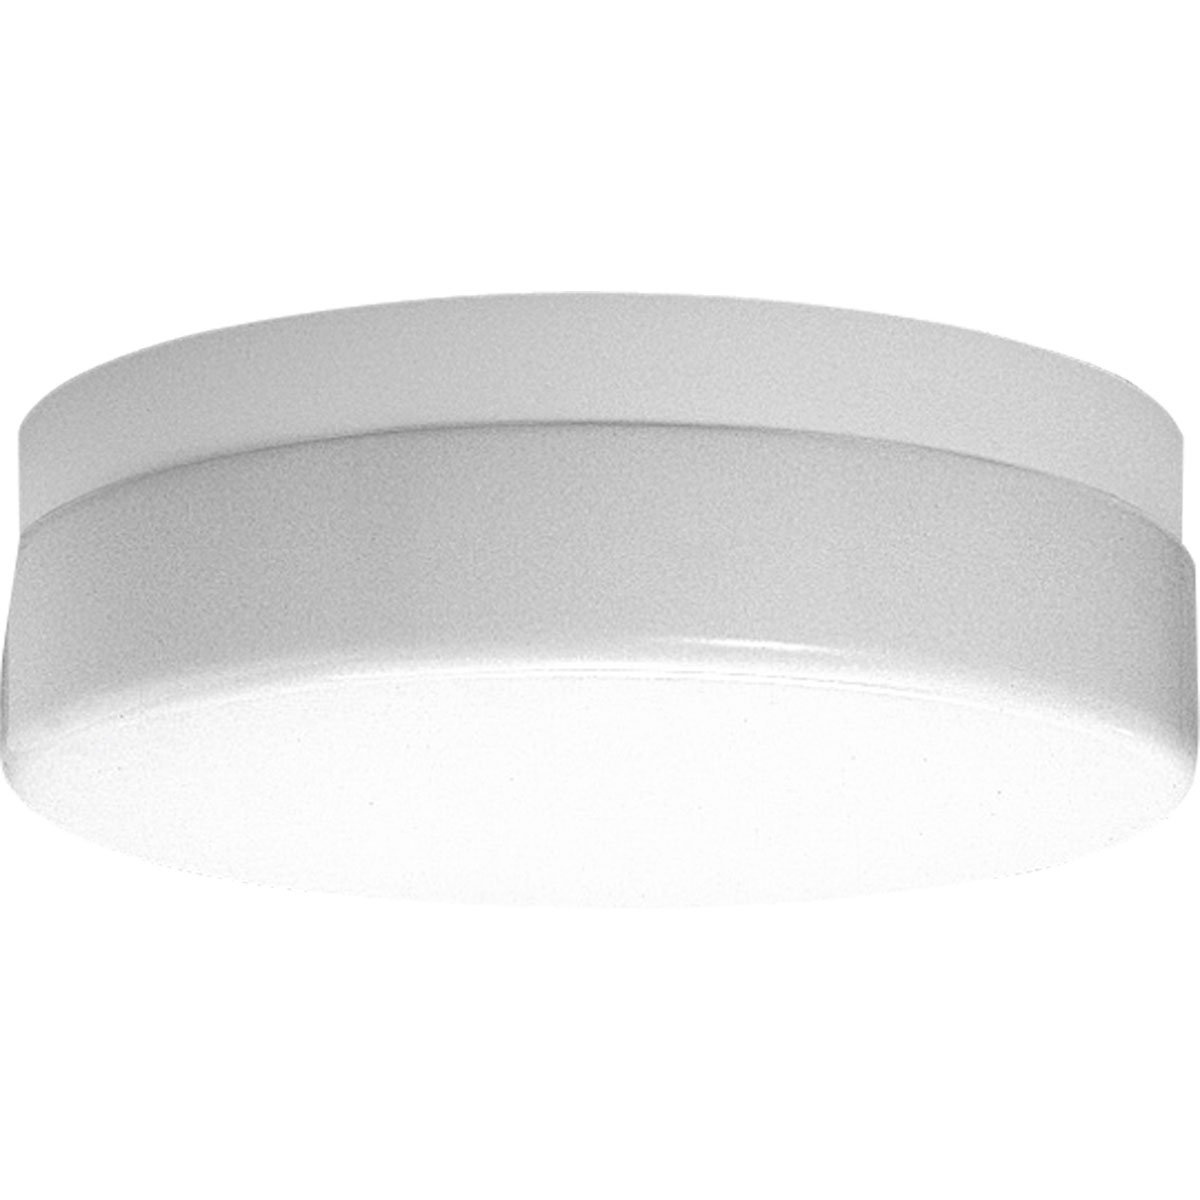 White Progress Lighting P7372-30STRWB White Acrylic Diffuser UL Approved For Damp Locations Rapid Start 120 Volt Normal Power Factor Ballast